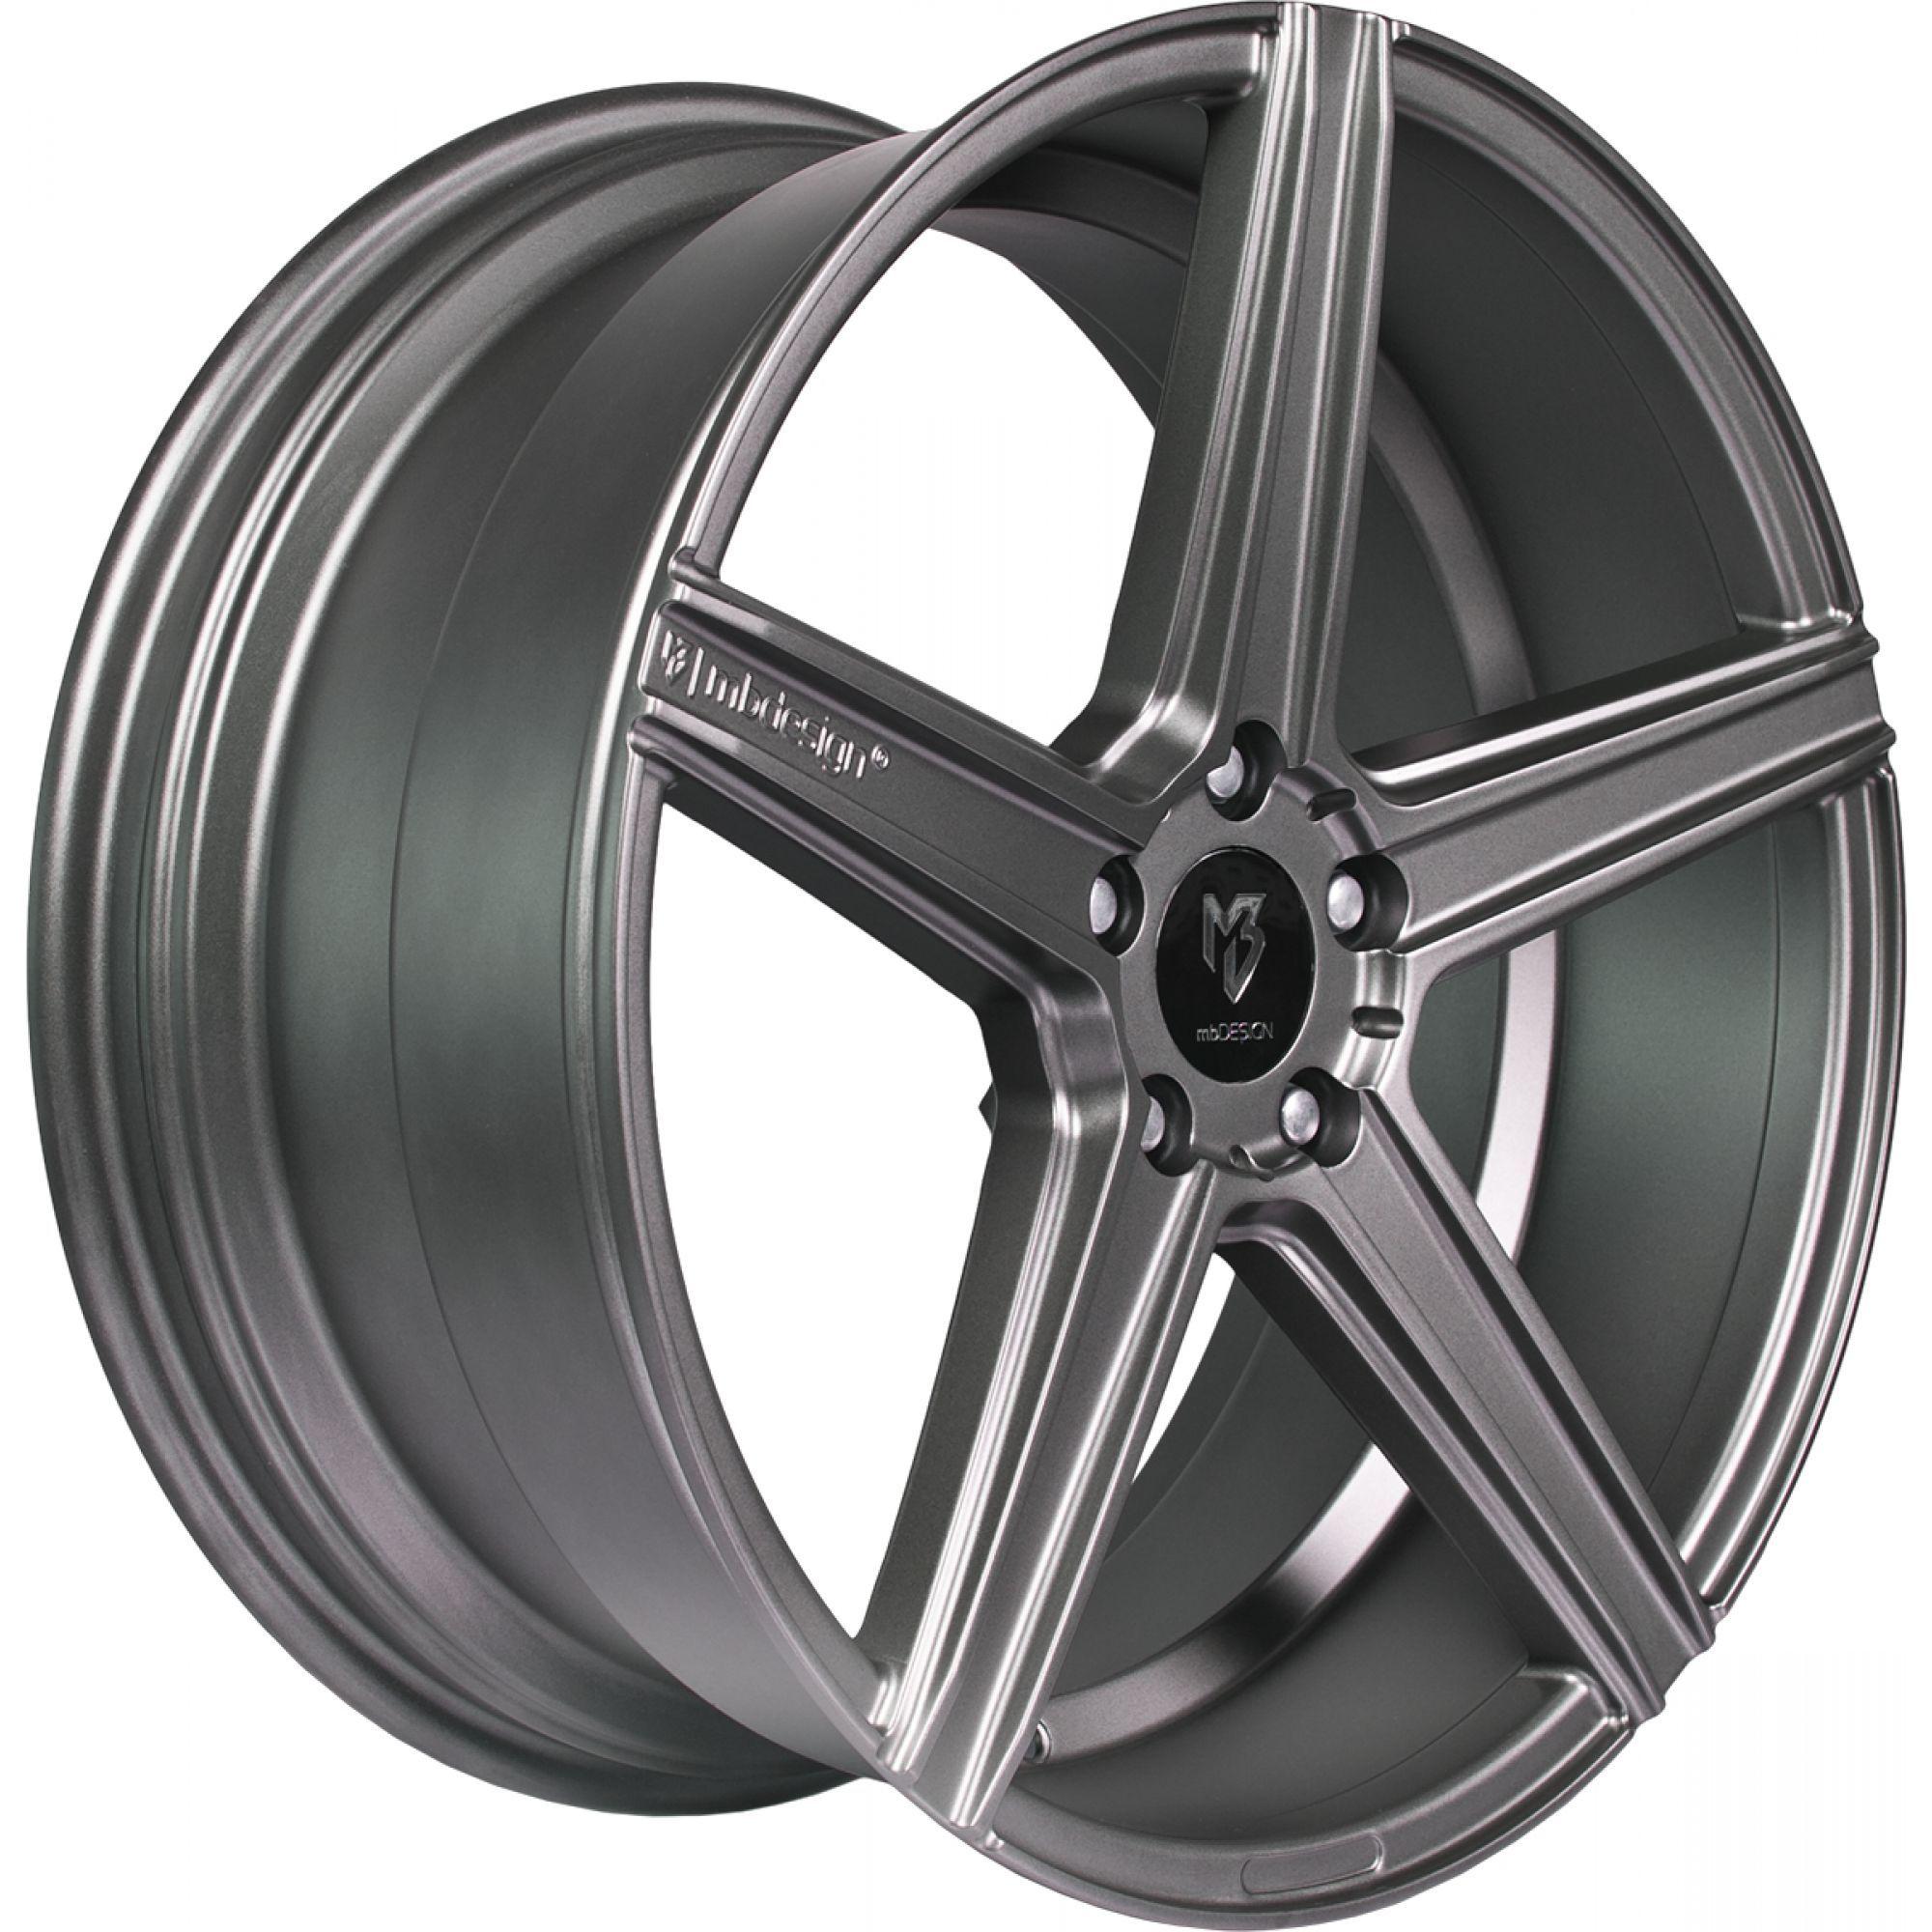 mb design kv1 felgen mattgrau in 19 zoll felgen pinterest wheels. Black Bedroom Furniture Sets. Home Design Ideas